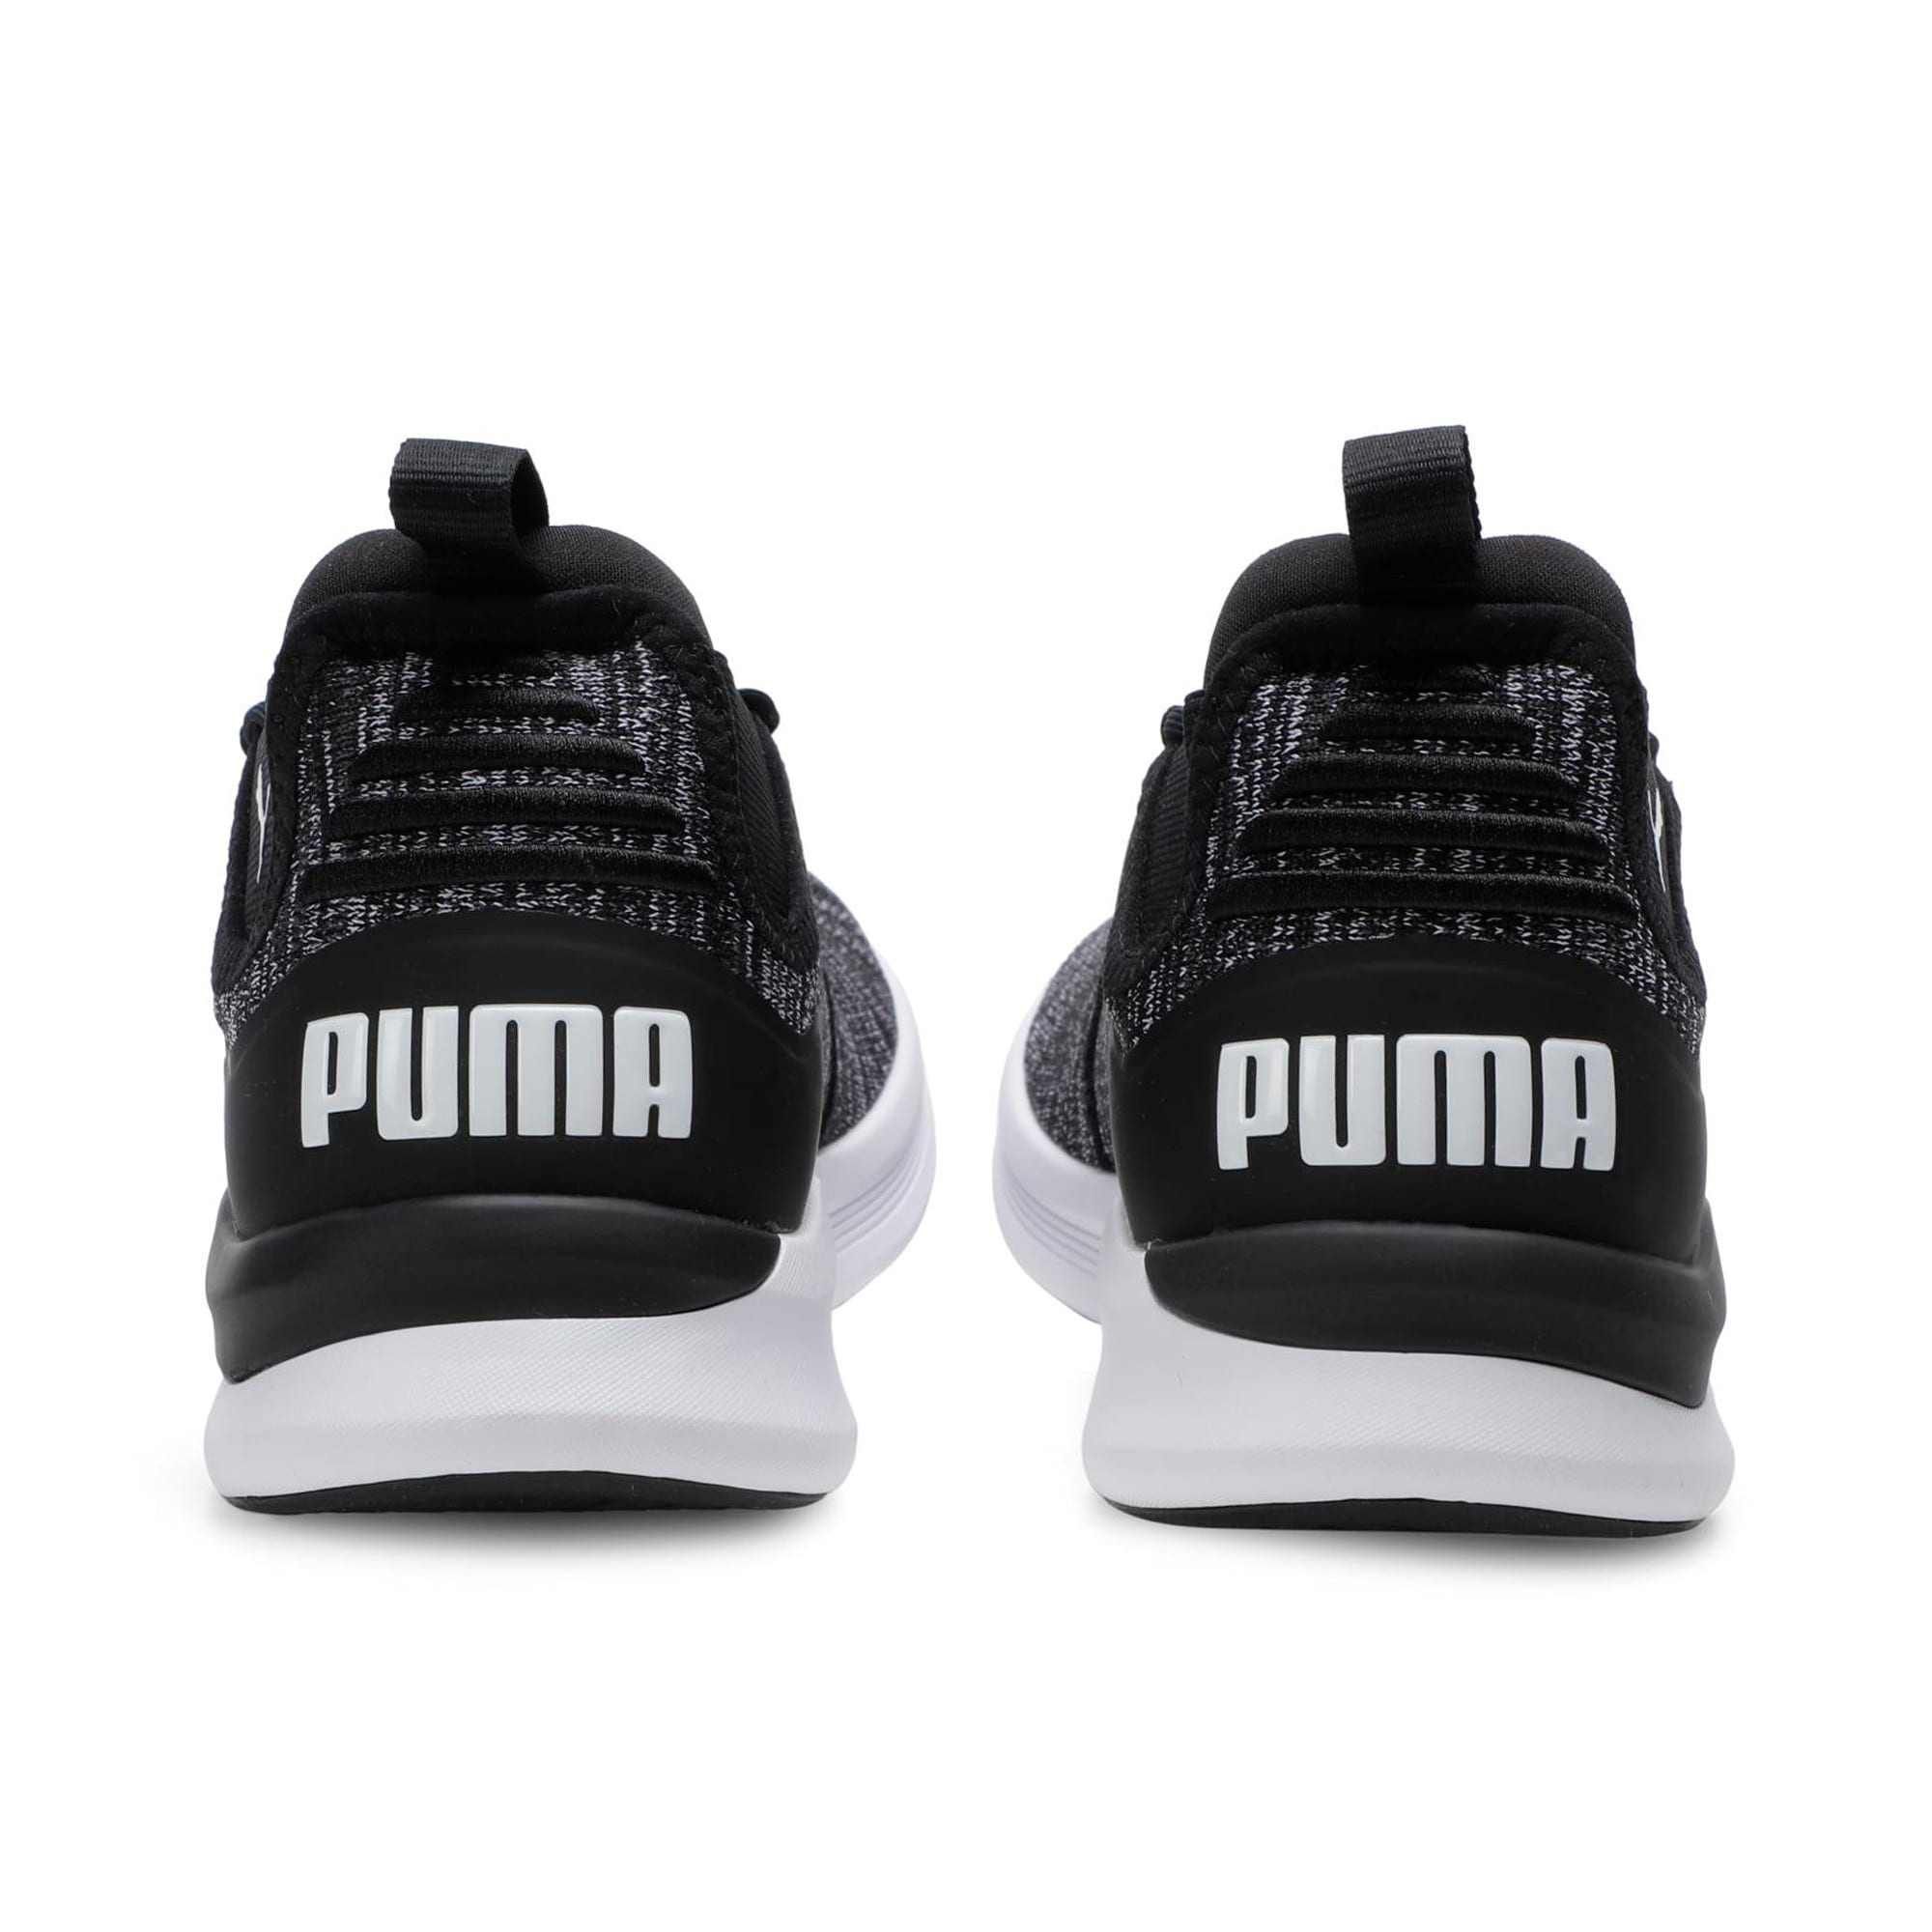 Thumbnail 3 of Flash Daunt Men's Running Shoes, Puma Black-Asphalt- White, medium-IND